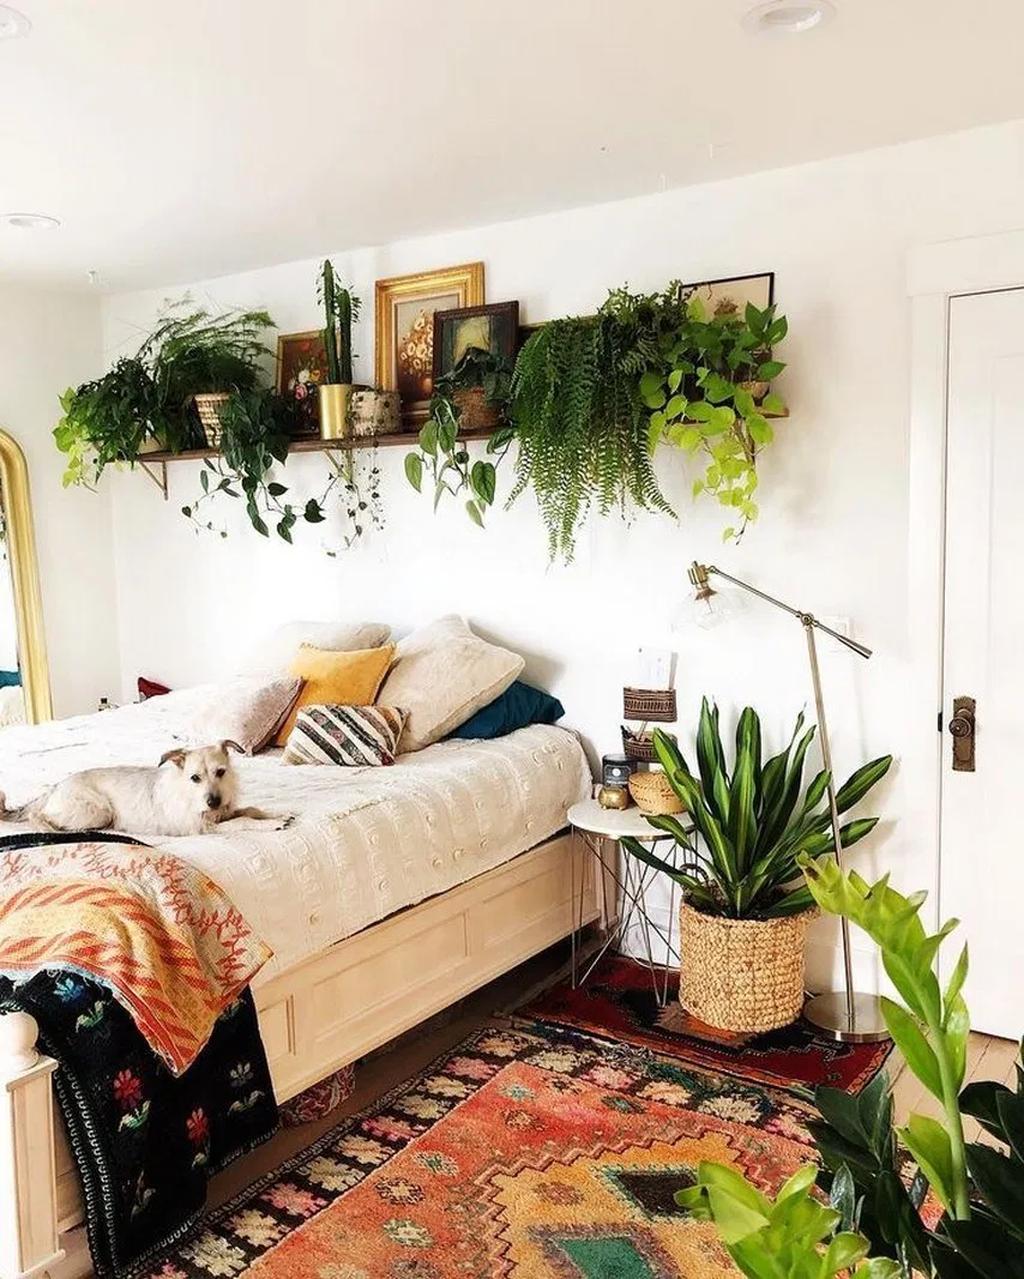 46+ Bedroom plant decorating ideas information